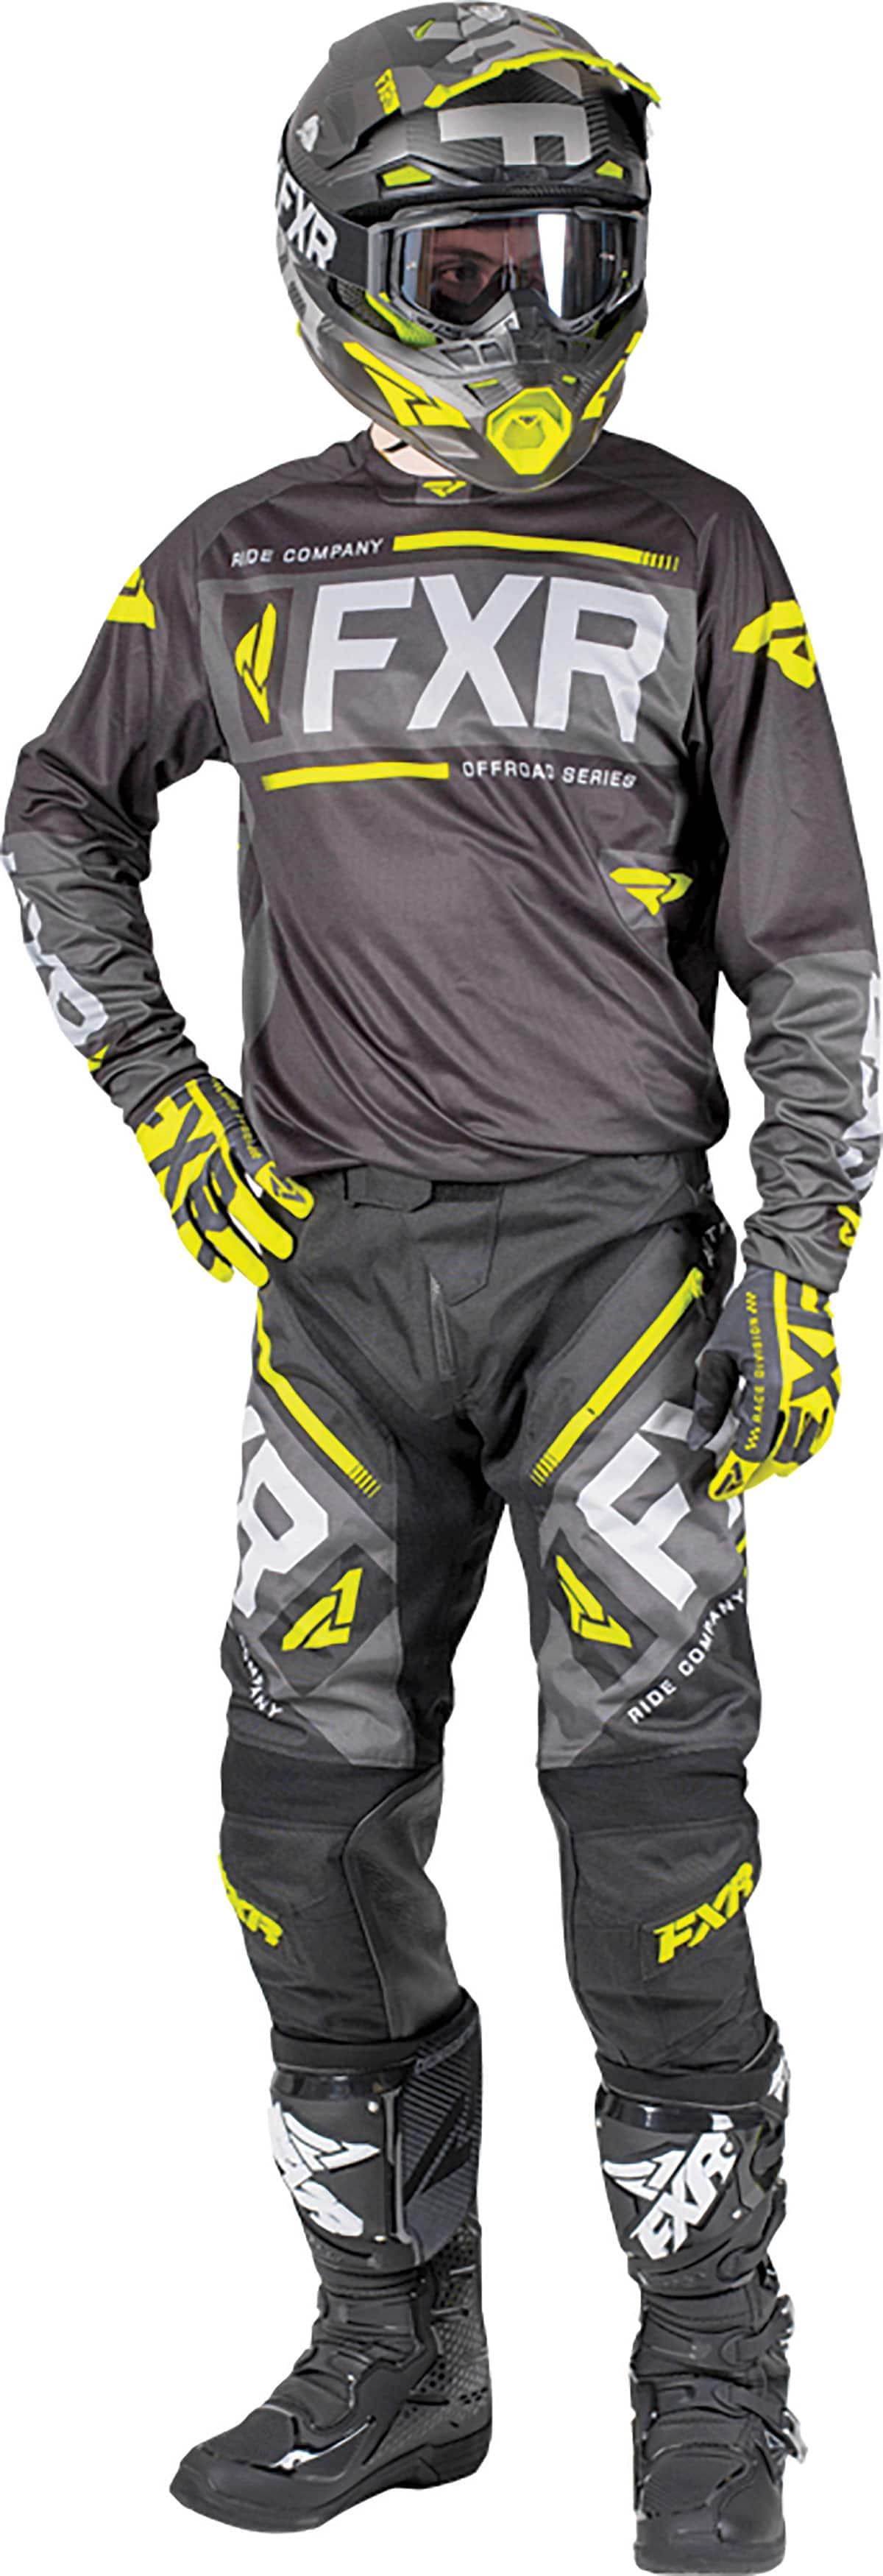 2017 Fox Racing Instinct Boots - MX ATV Motocross Off-Road ...  |Dirt Road Apparel